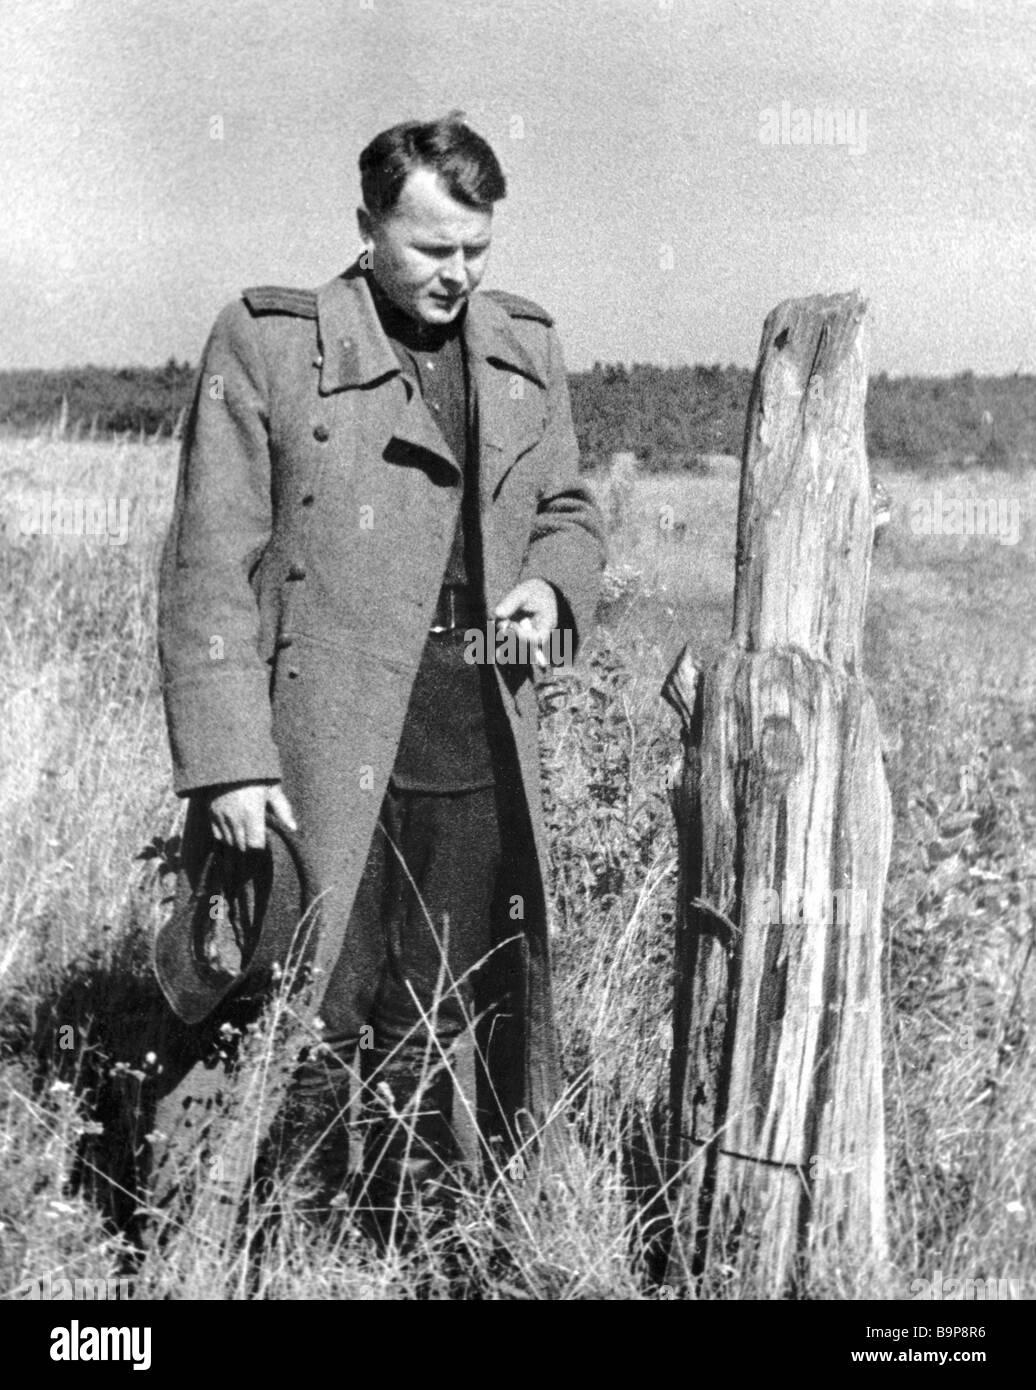 Poem A.T. Tvardovskys Vasily Terkin. The image of Vasily Terkin